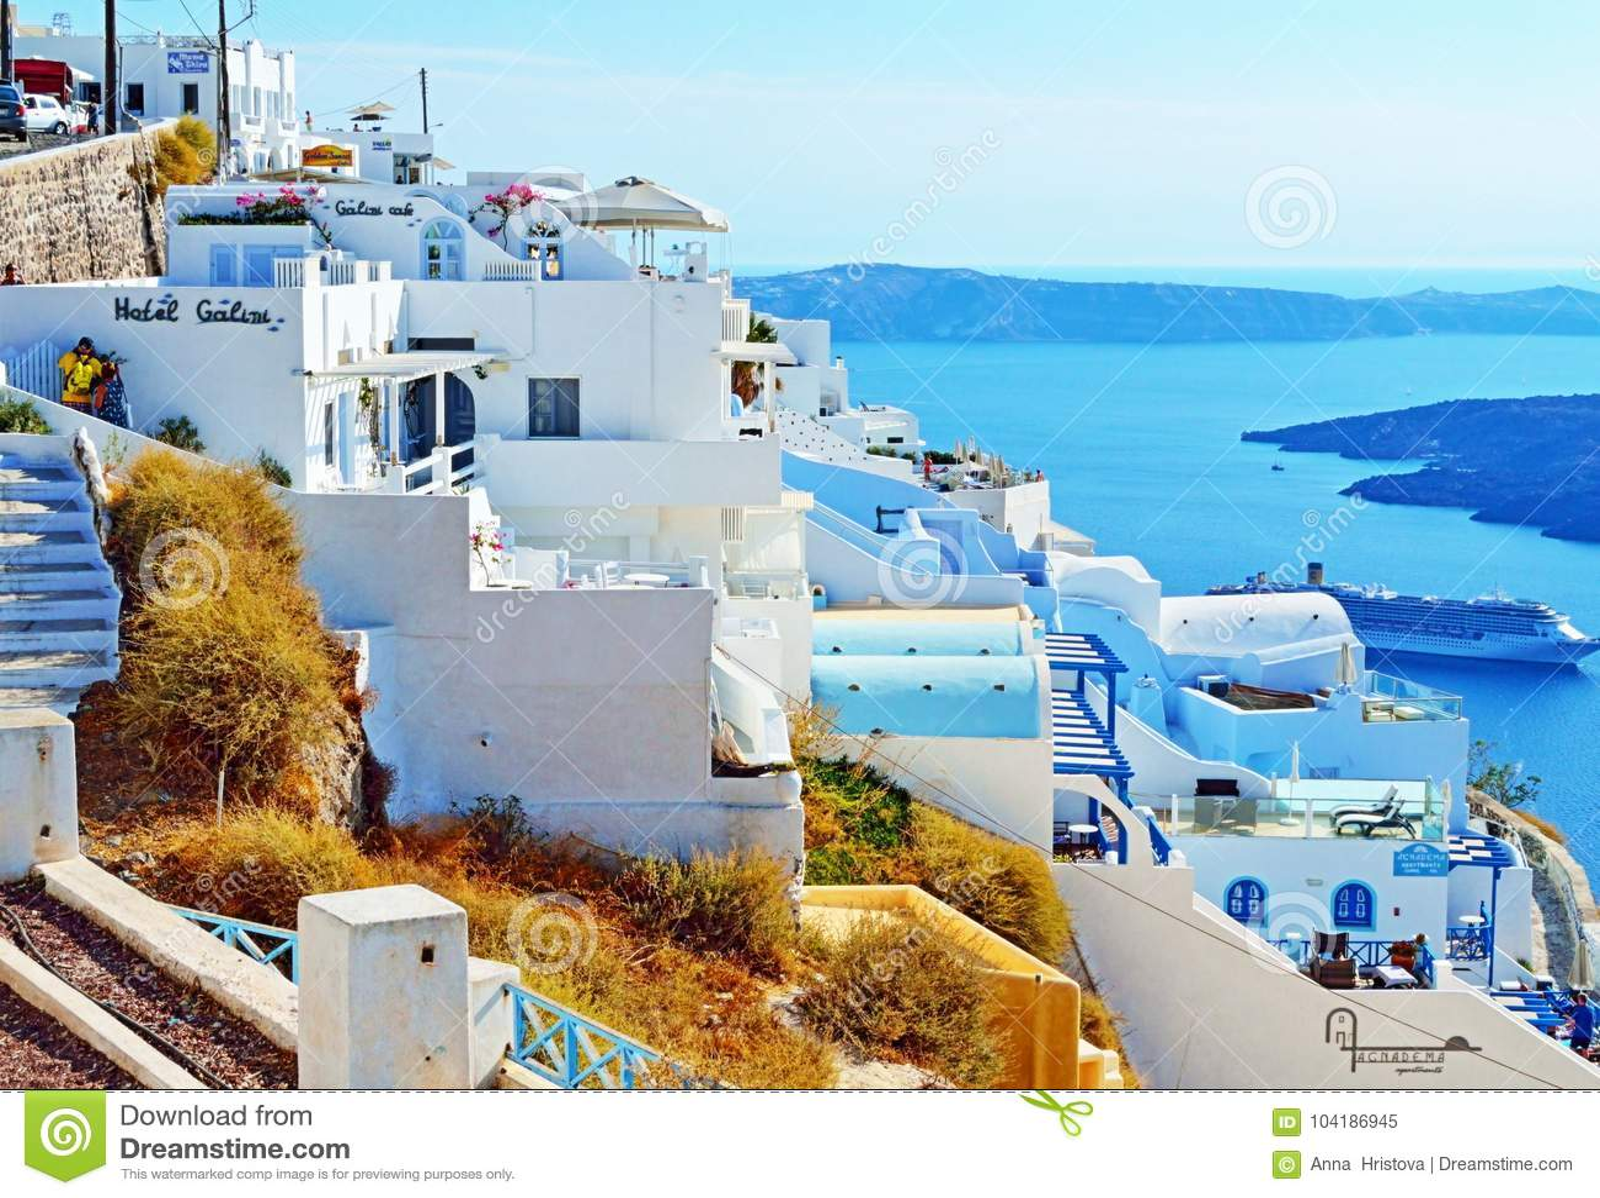 Luxury Hotels Sea Views Santorini Cyclades Greece Editorial Image